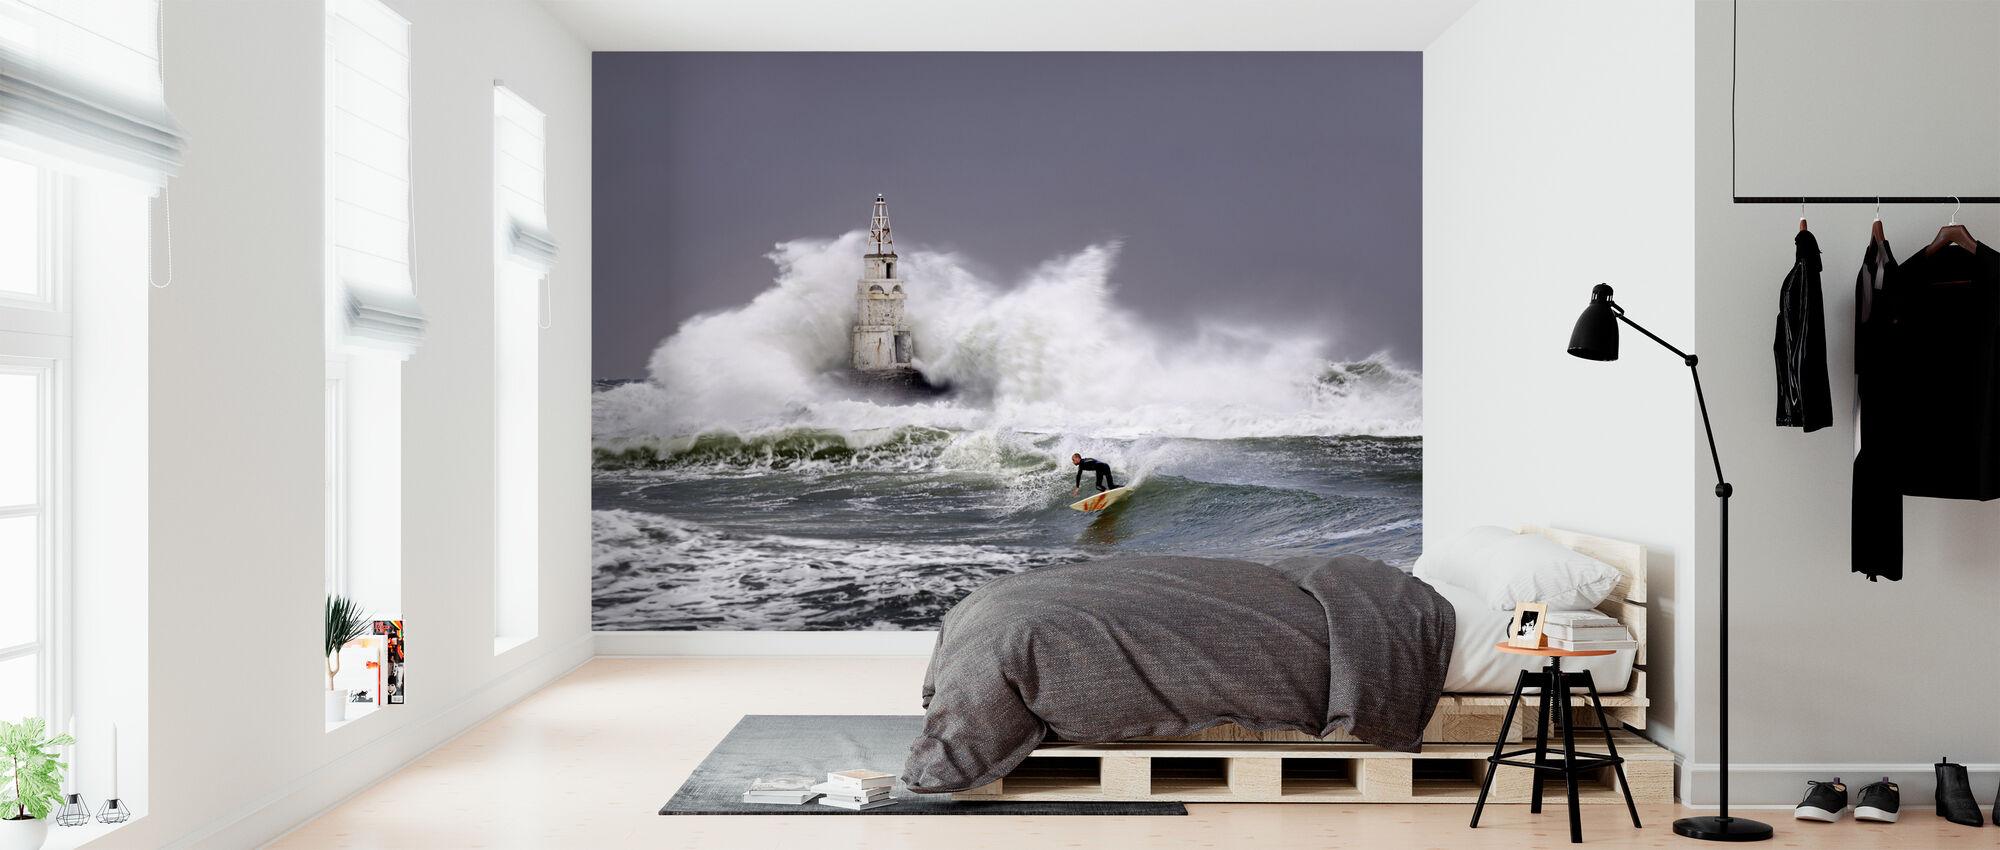 Lighthouse Surfer - Wallpaper - Bedroom